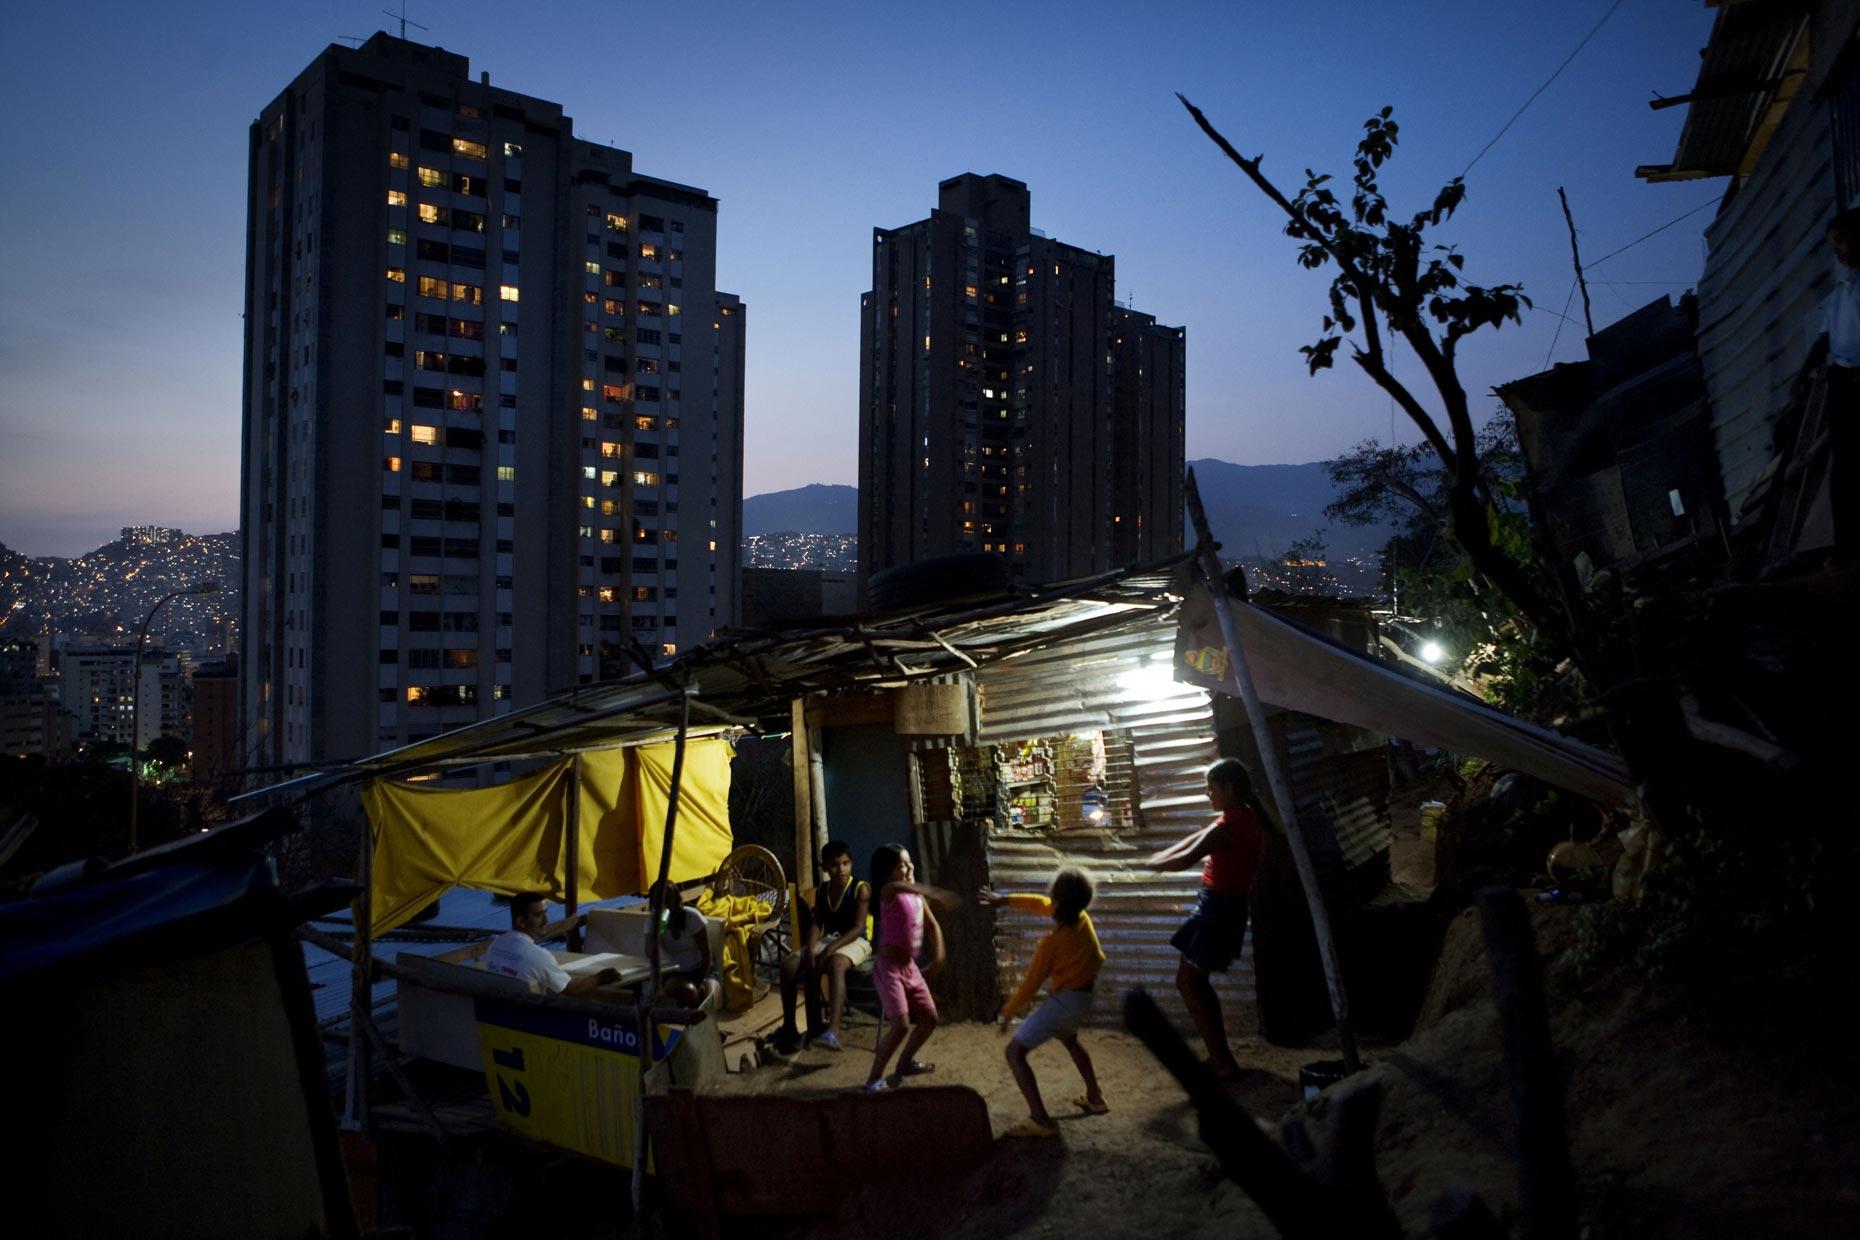 VENEZUELA. Caracas. 2007. New squatter settlements on a hillside in north Caracas.